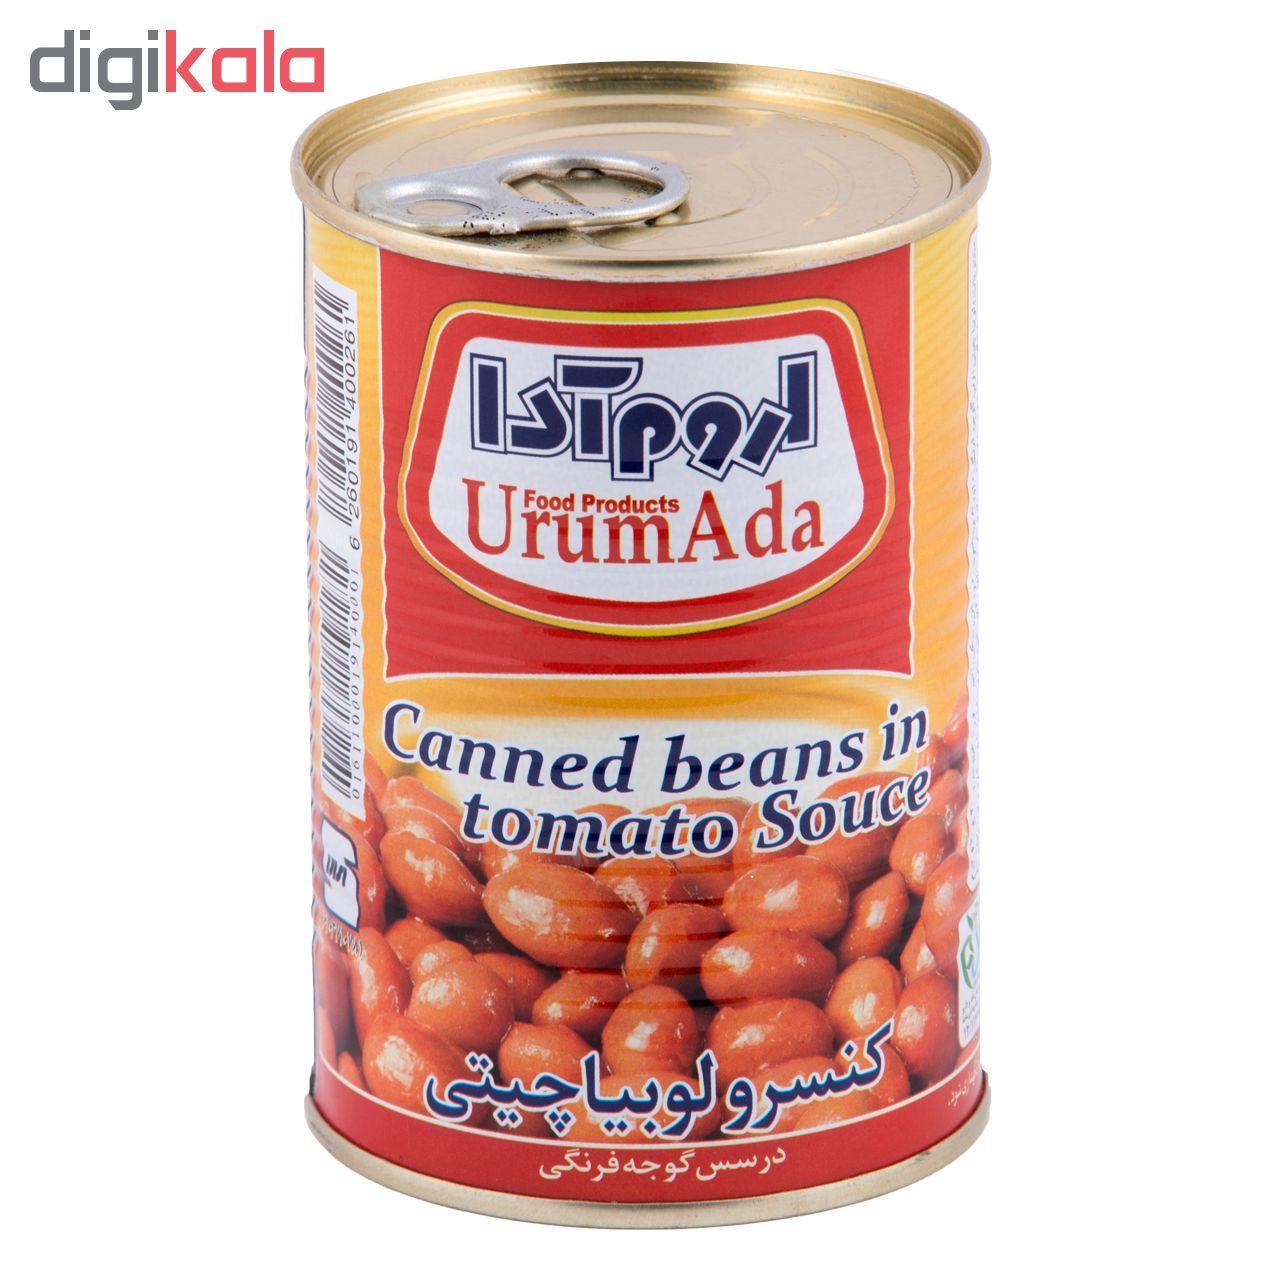 کنسرو لوبیا چیتی در سس گوجه فرنگی اروم آدا مقدار 400 گرم main 1 1